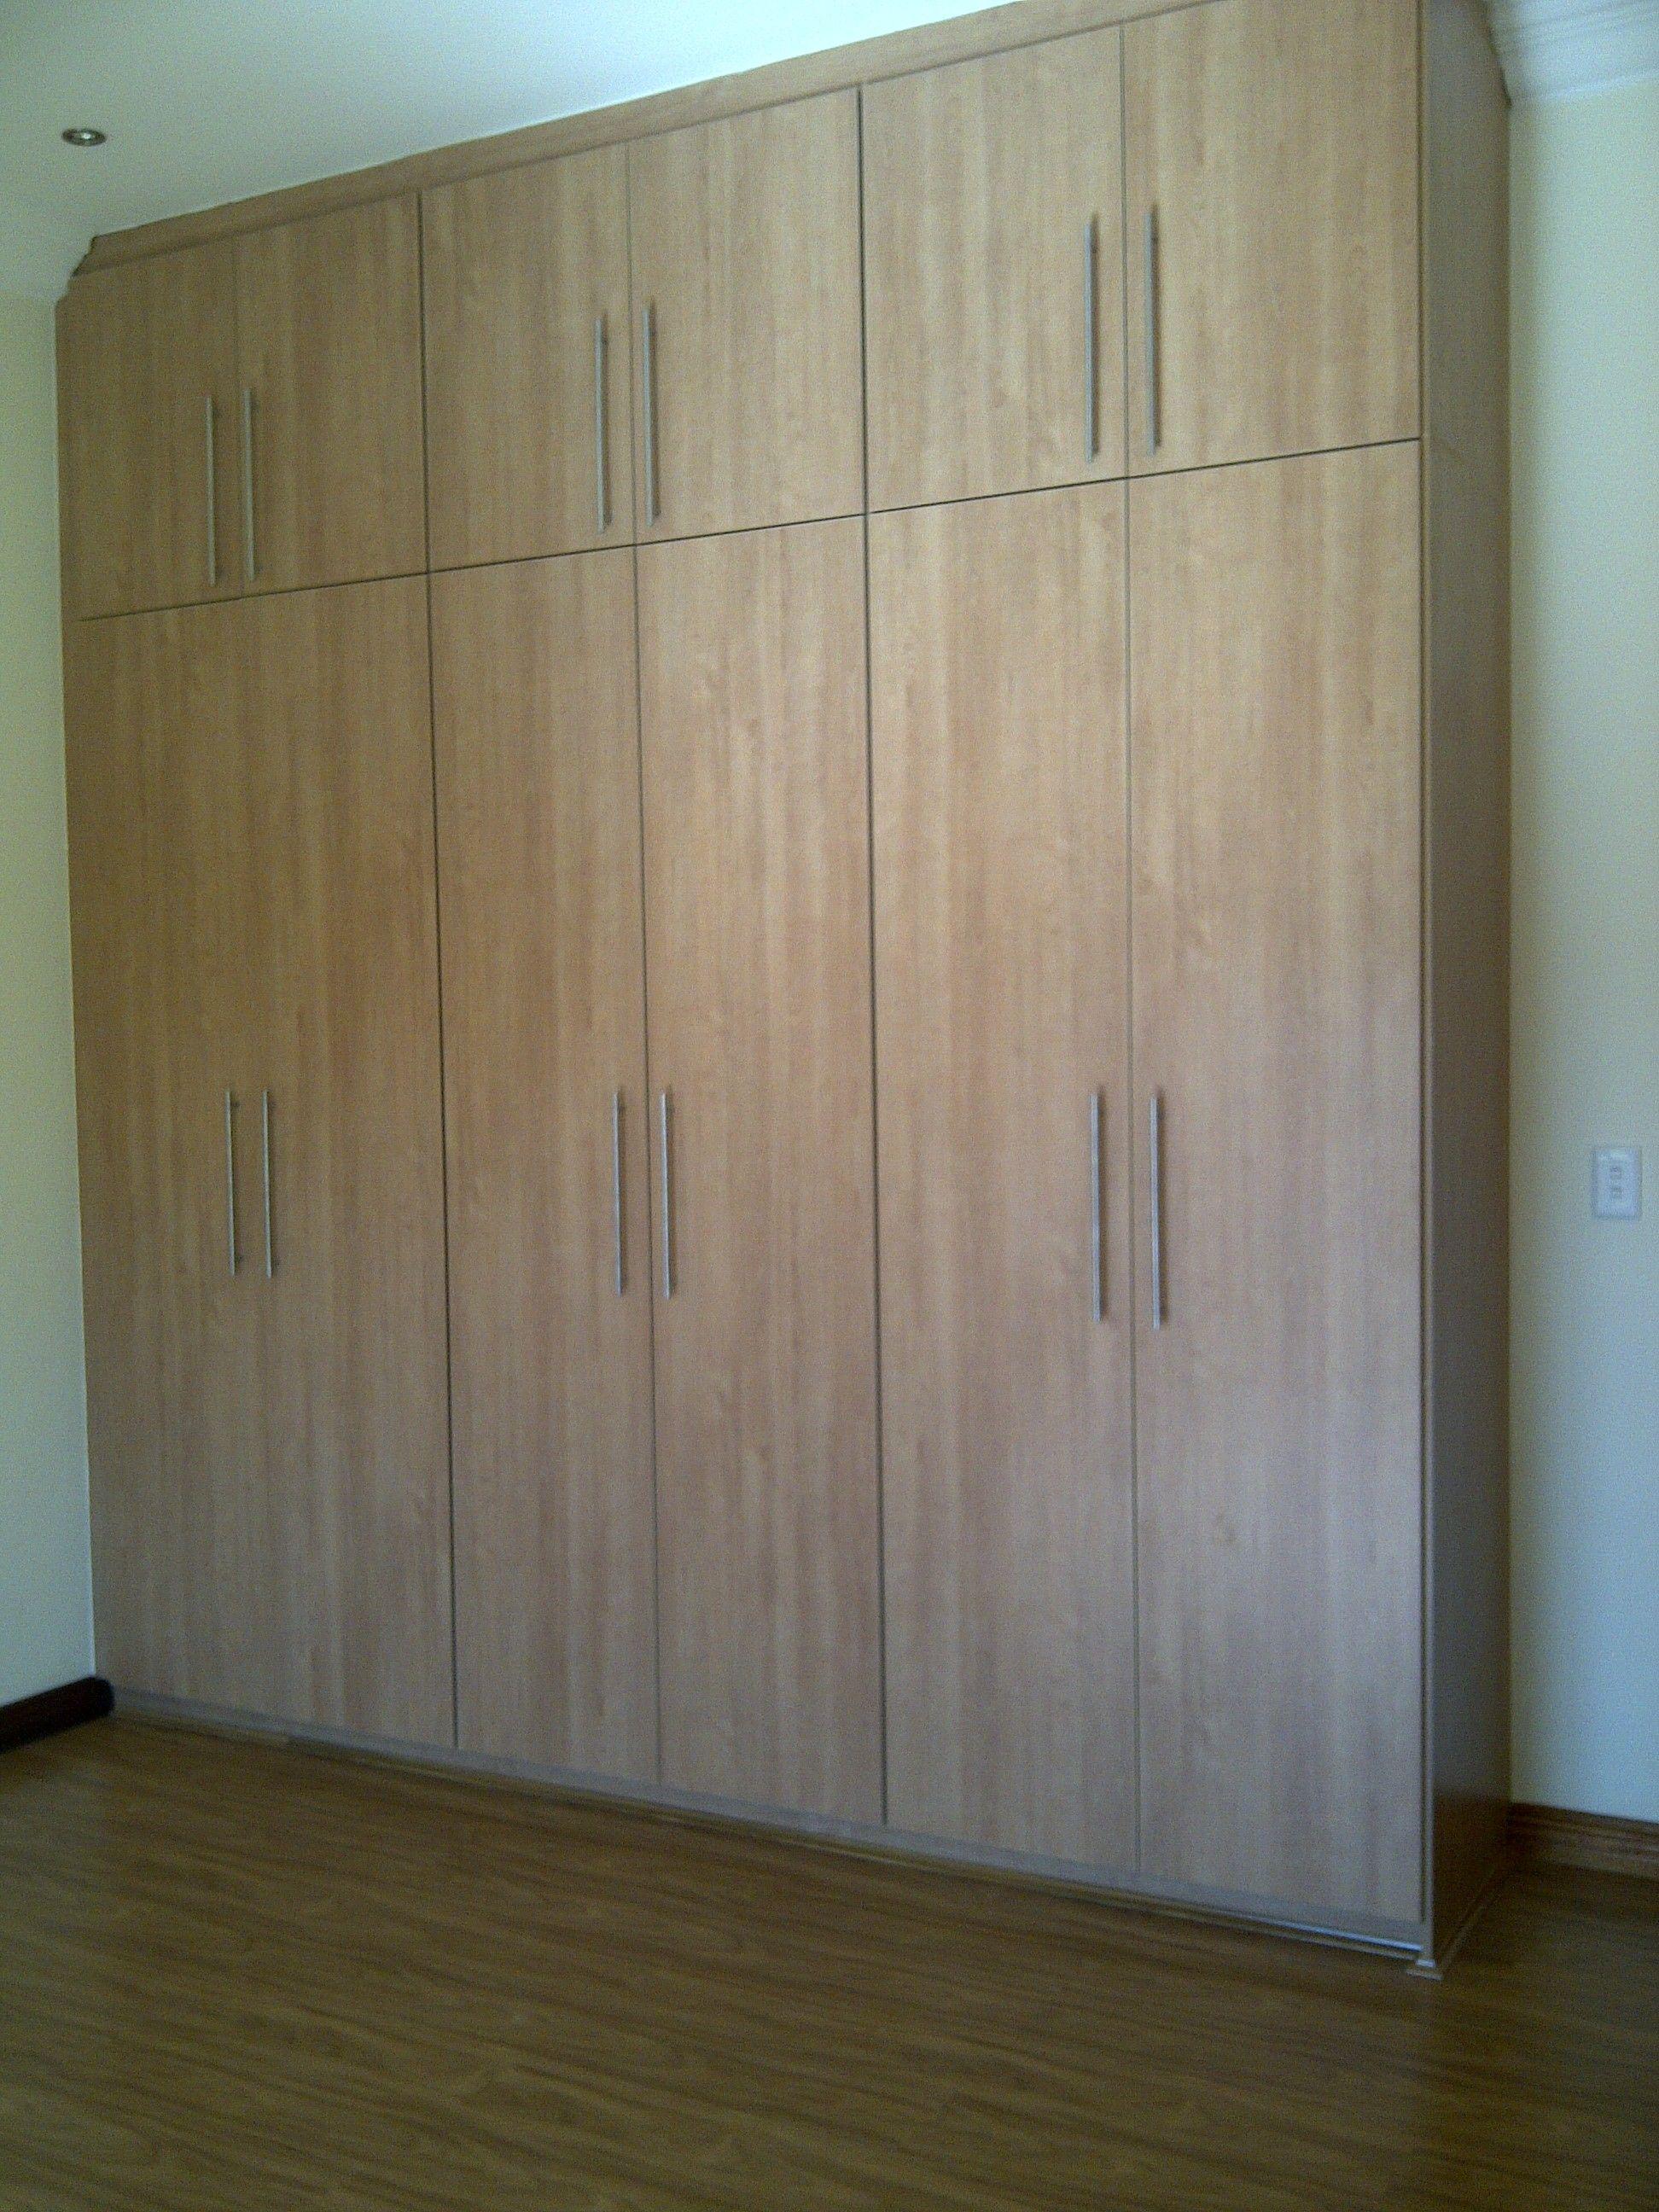 Double Volume Bedroom Cupboards Hardvard Cherry Melamine Tall Cabinet Storage Bedroom Cupboards Cupboard